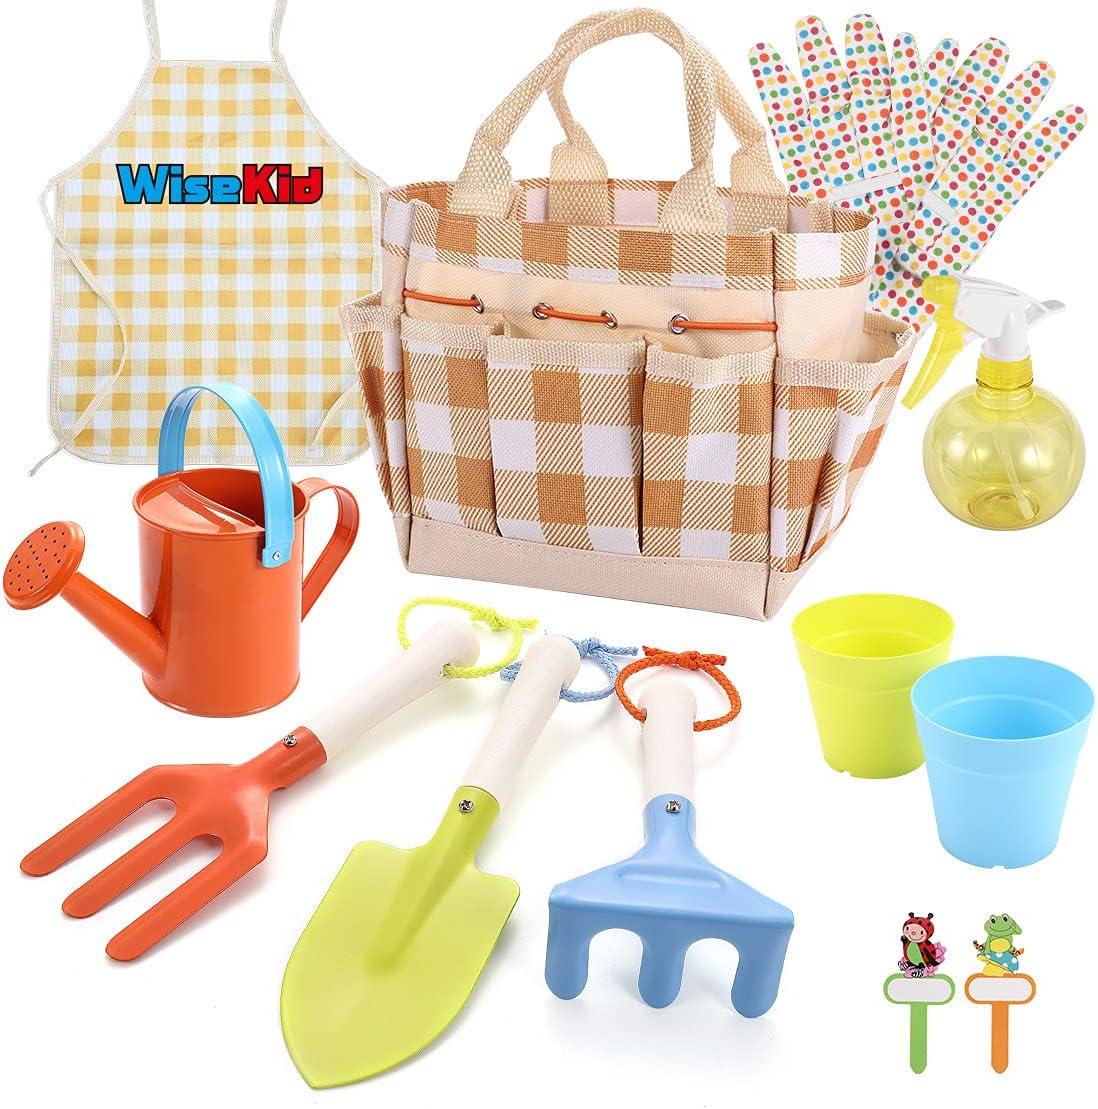 Wisekid Kids Gardening Tool Set, 12-Piece Includes Kids Size For